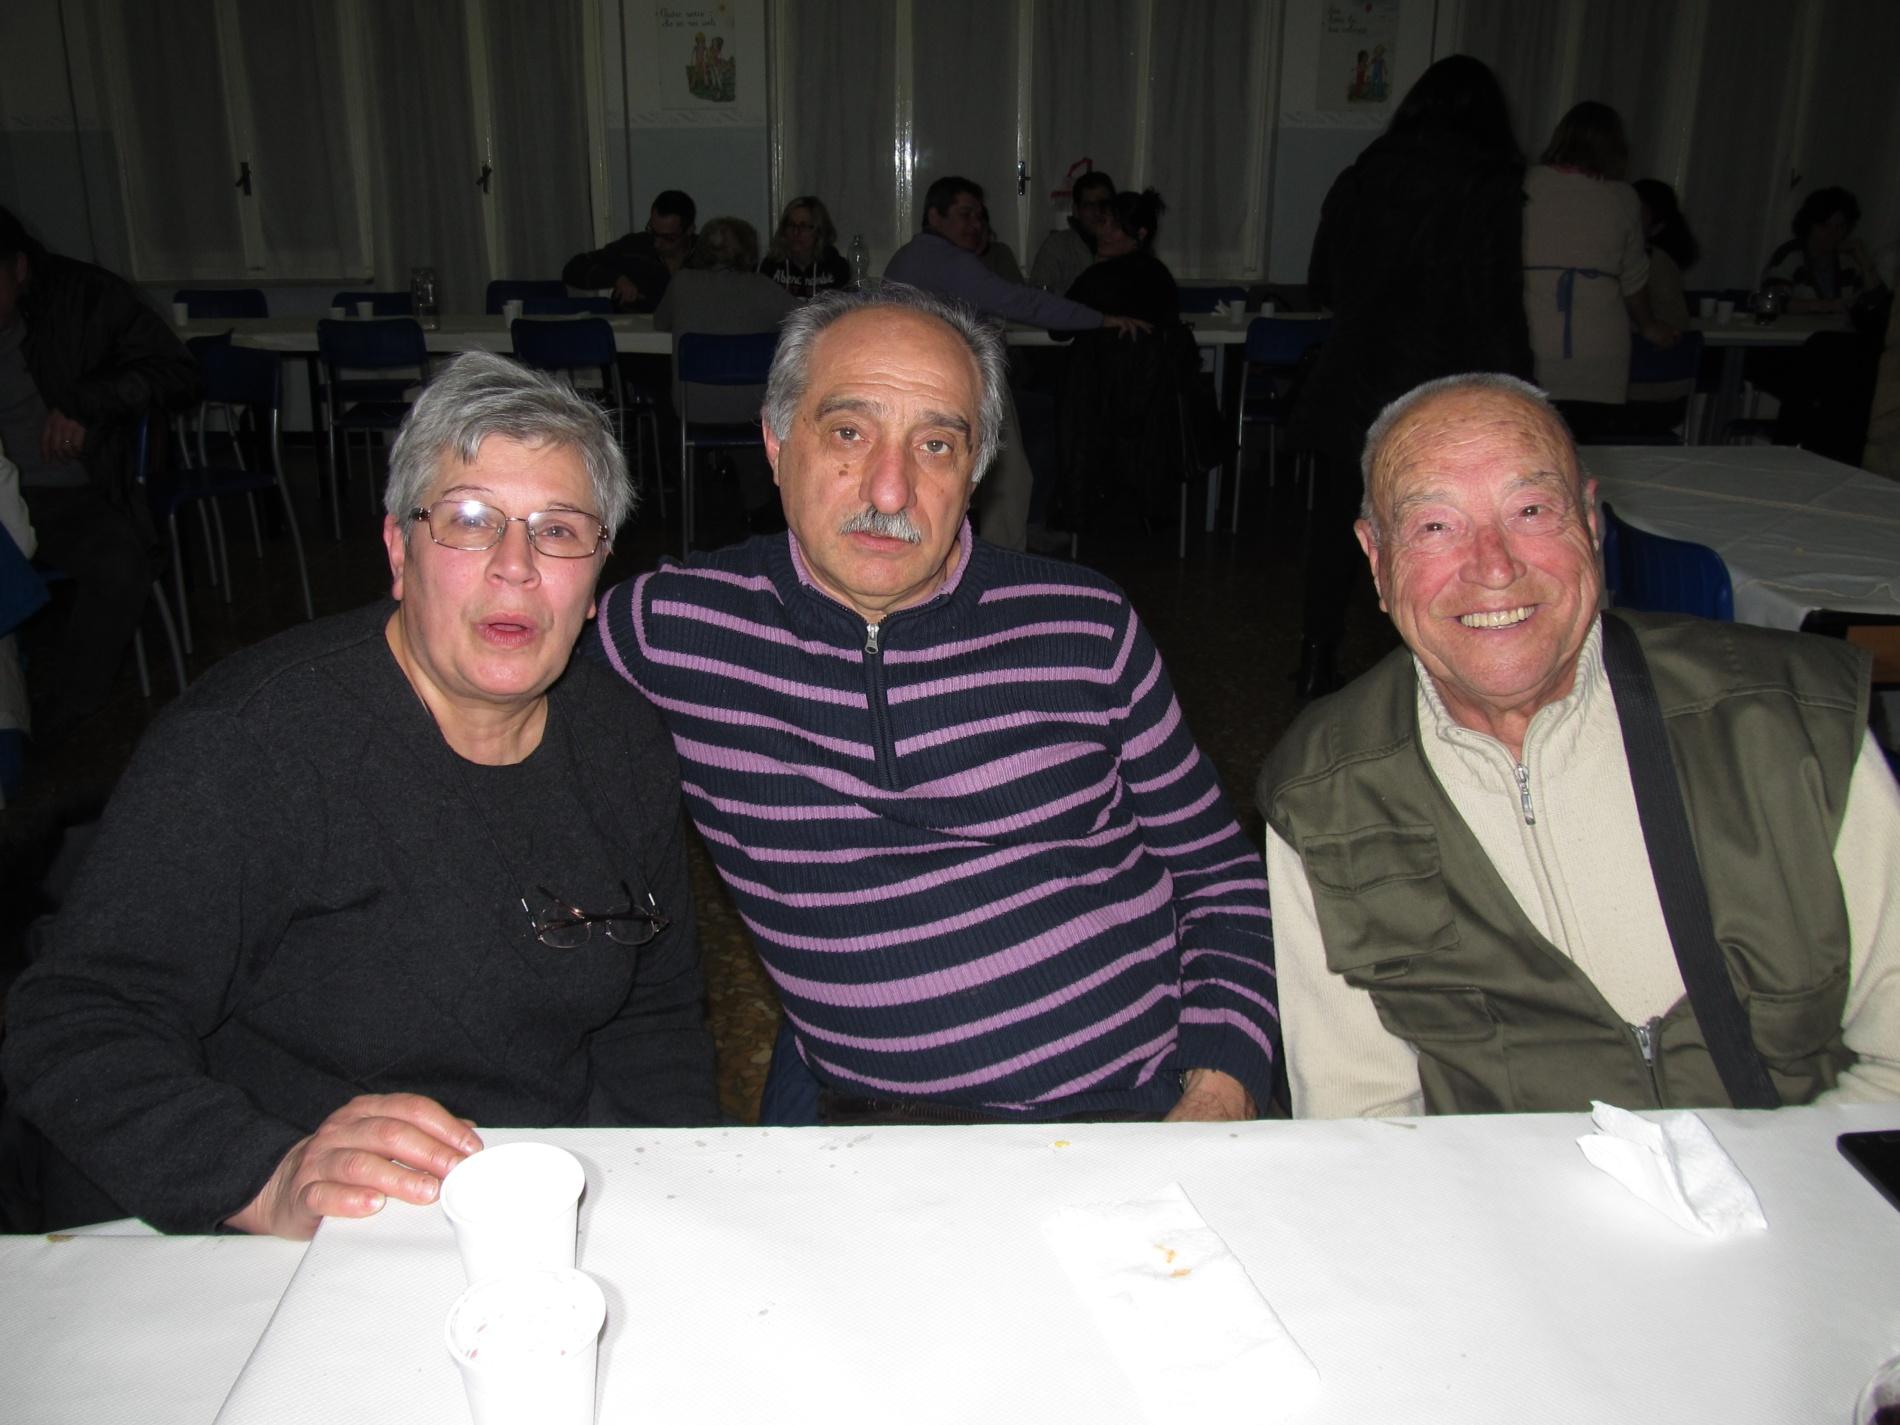 polentata-2015-03-07-21-23-58